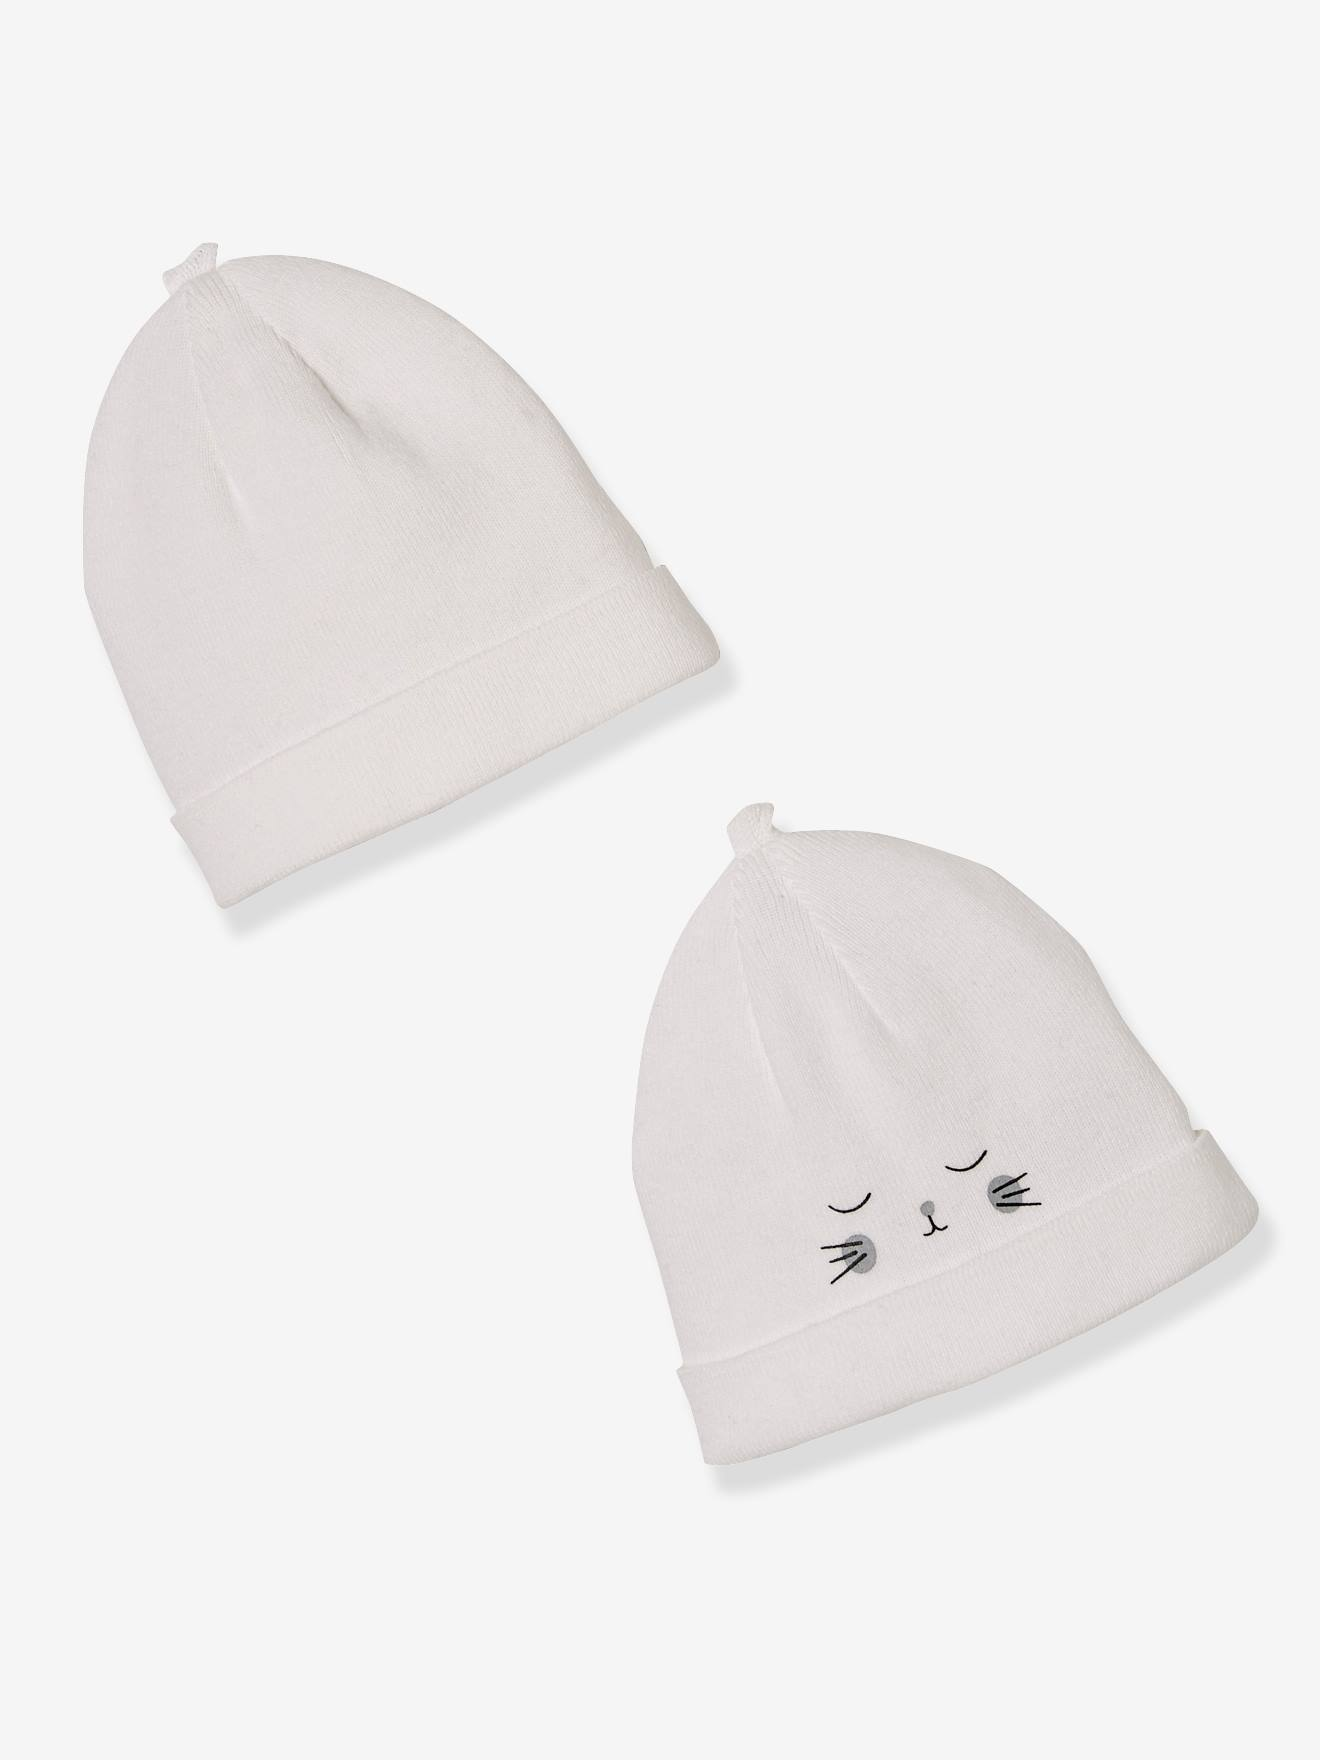 Newborn Tiny Baby Boys Cars Sleepsuit Set Cradle Cute Cap Hat Outfit Premature